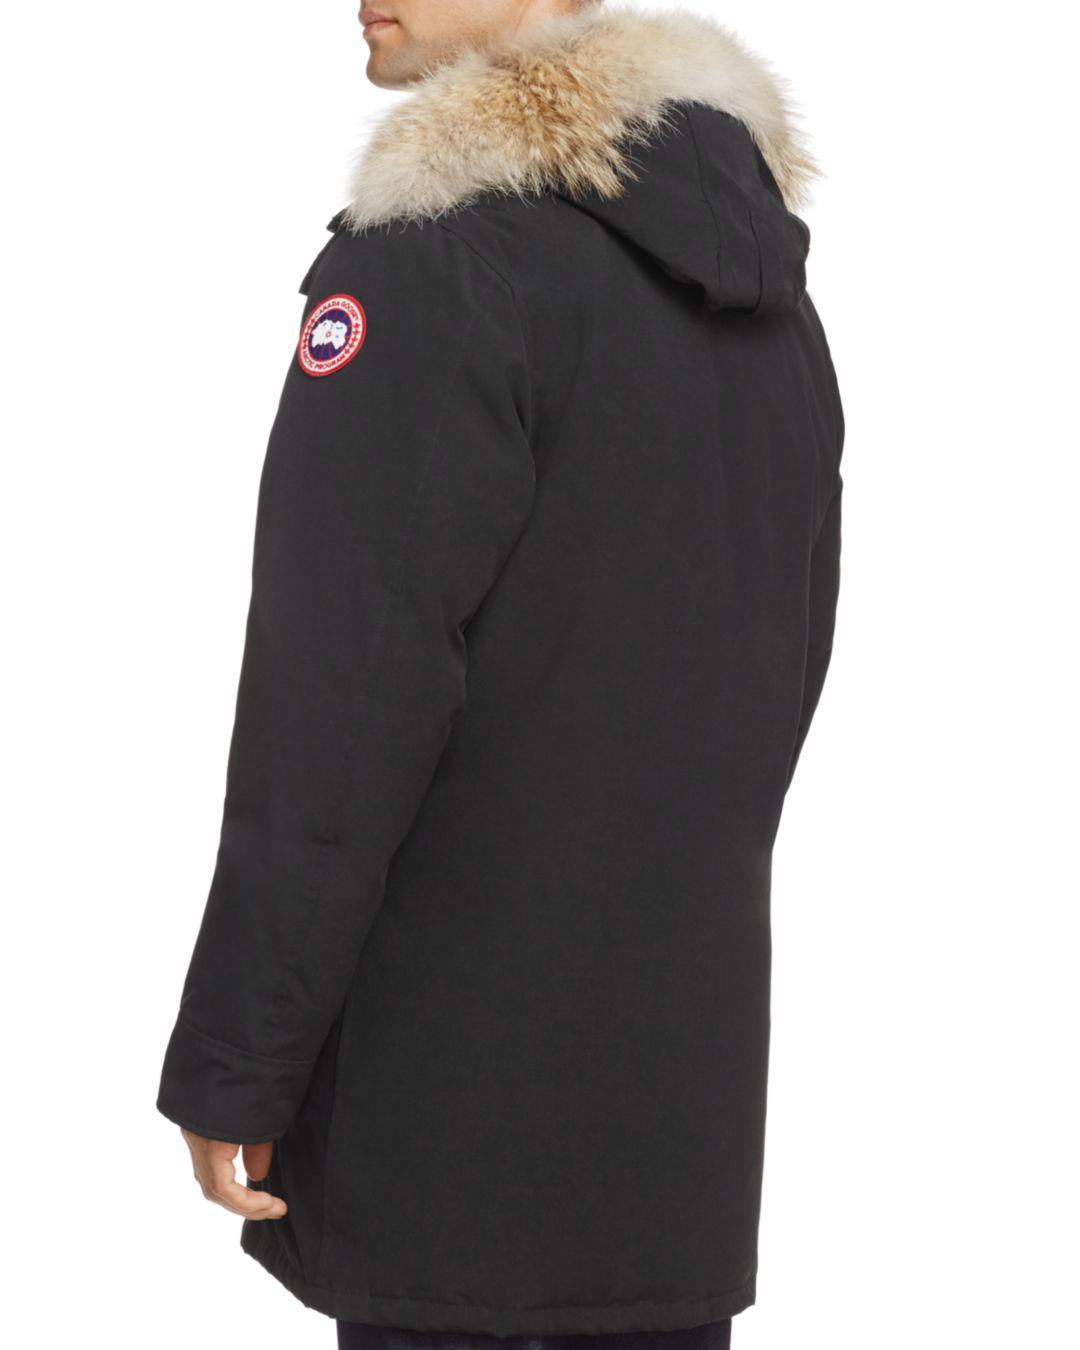 4d7f7c8661bb promo code for lyst canada goose langford fur lined parka in black for men  ce7f0 001d7